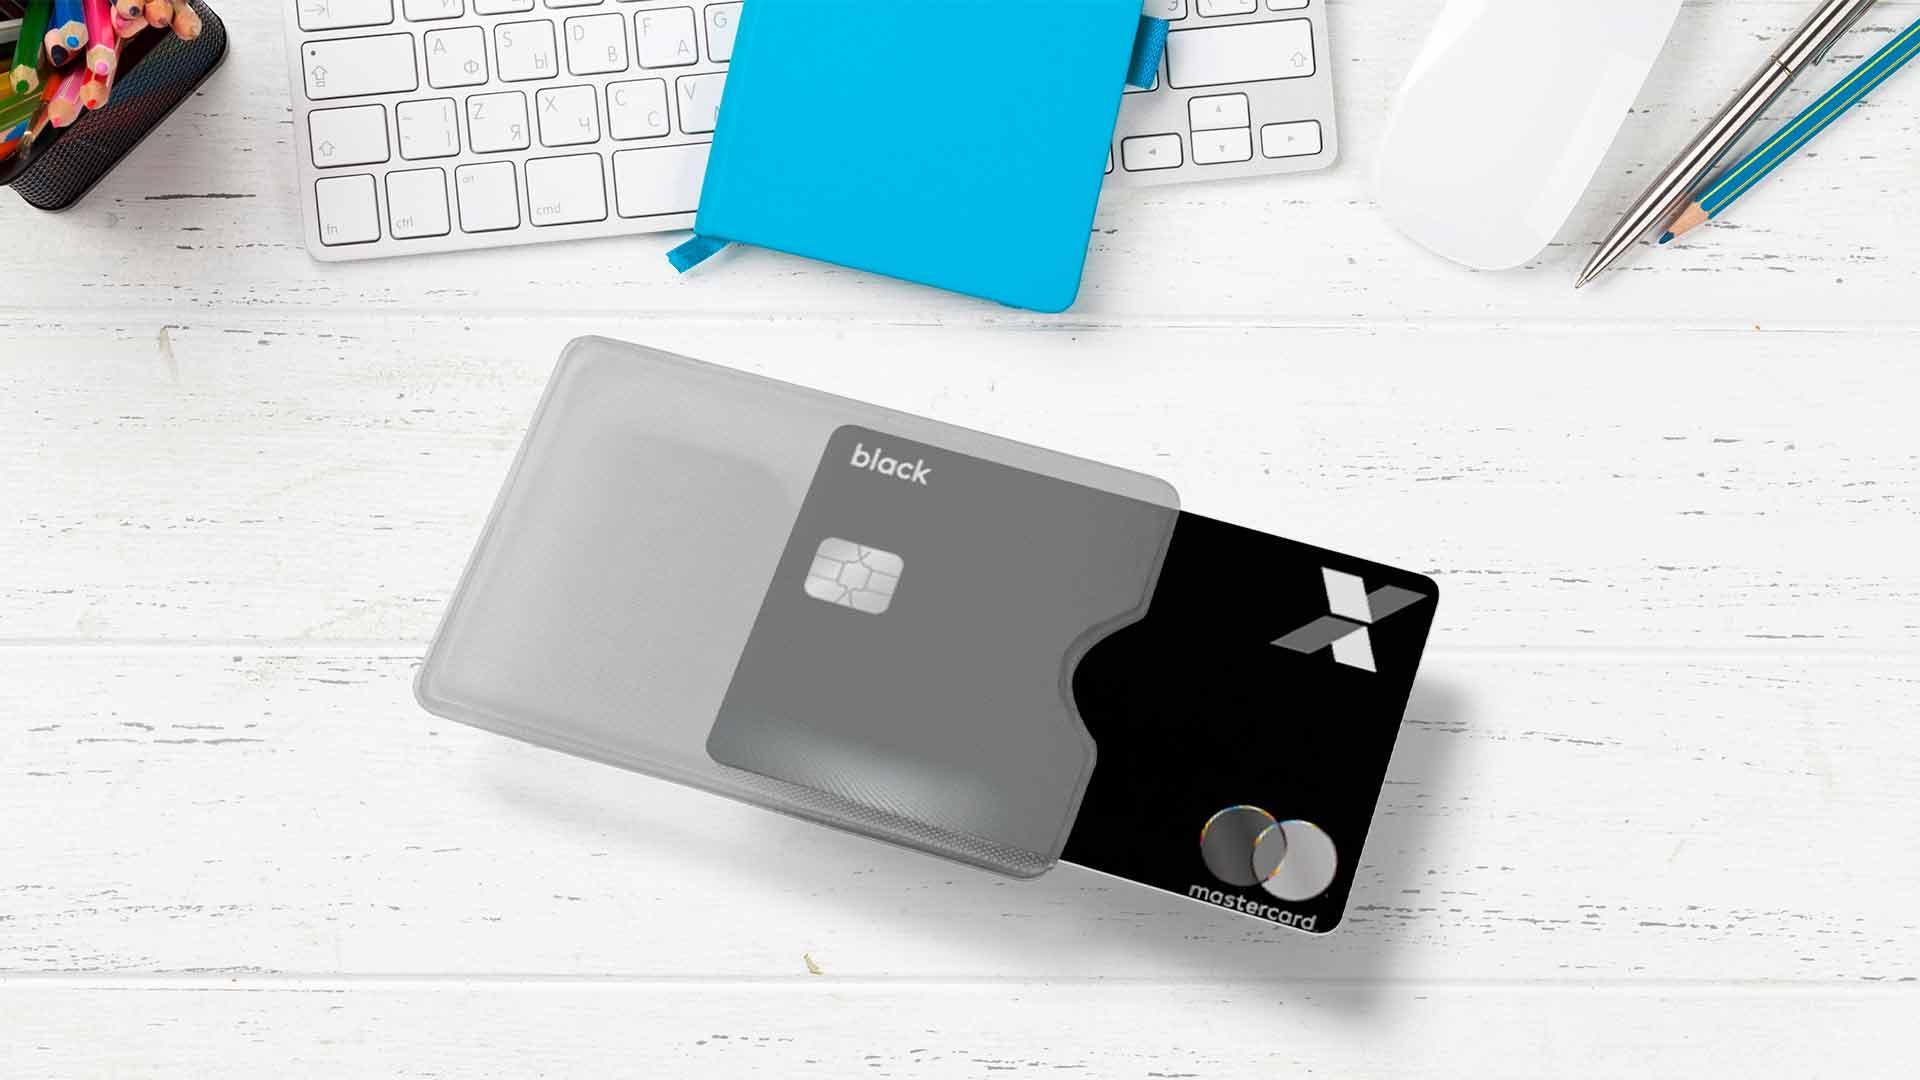 cartao-de-credito-mastercard-black-caixa-todas-as-vantagens-de-ter-um.jpg